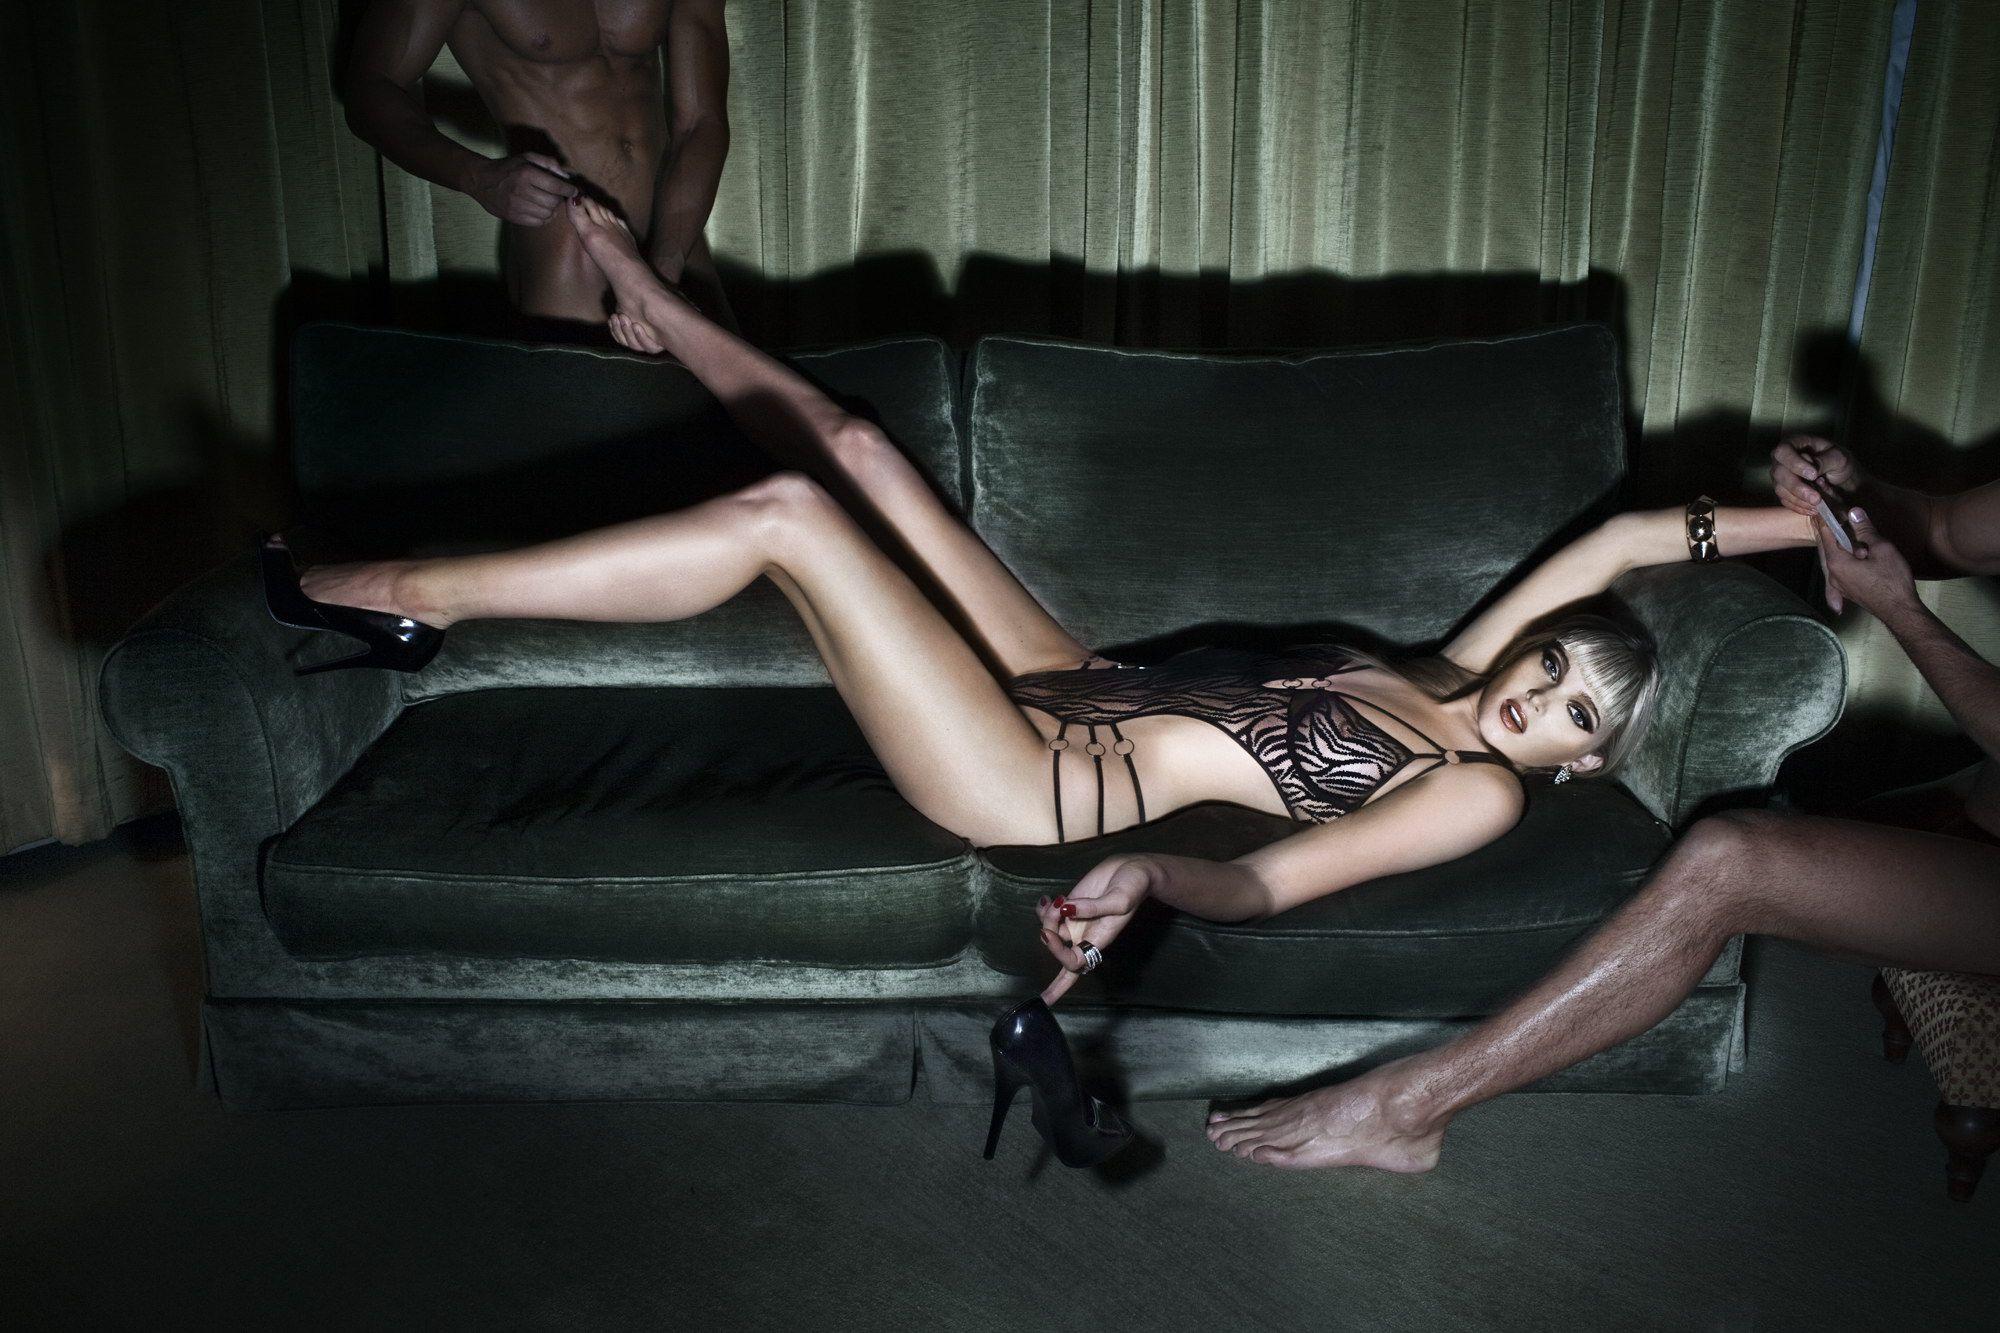 elsa-hosk-nude-for-treats-magazine-3629